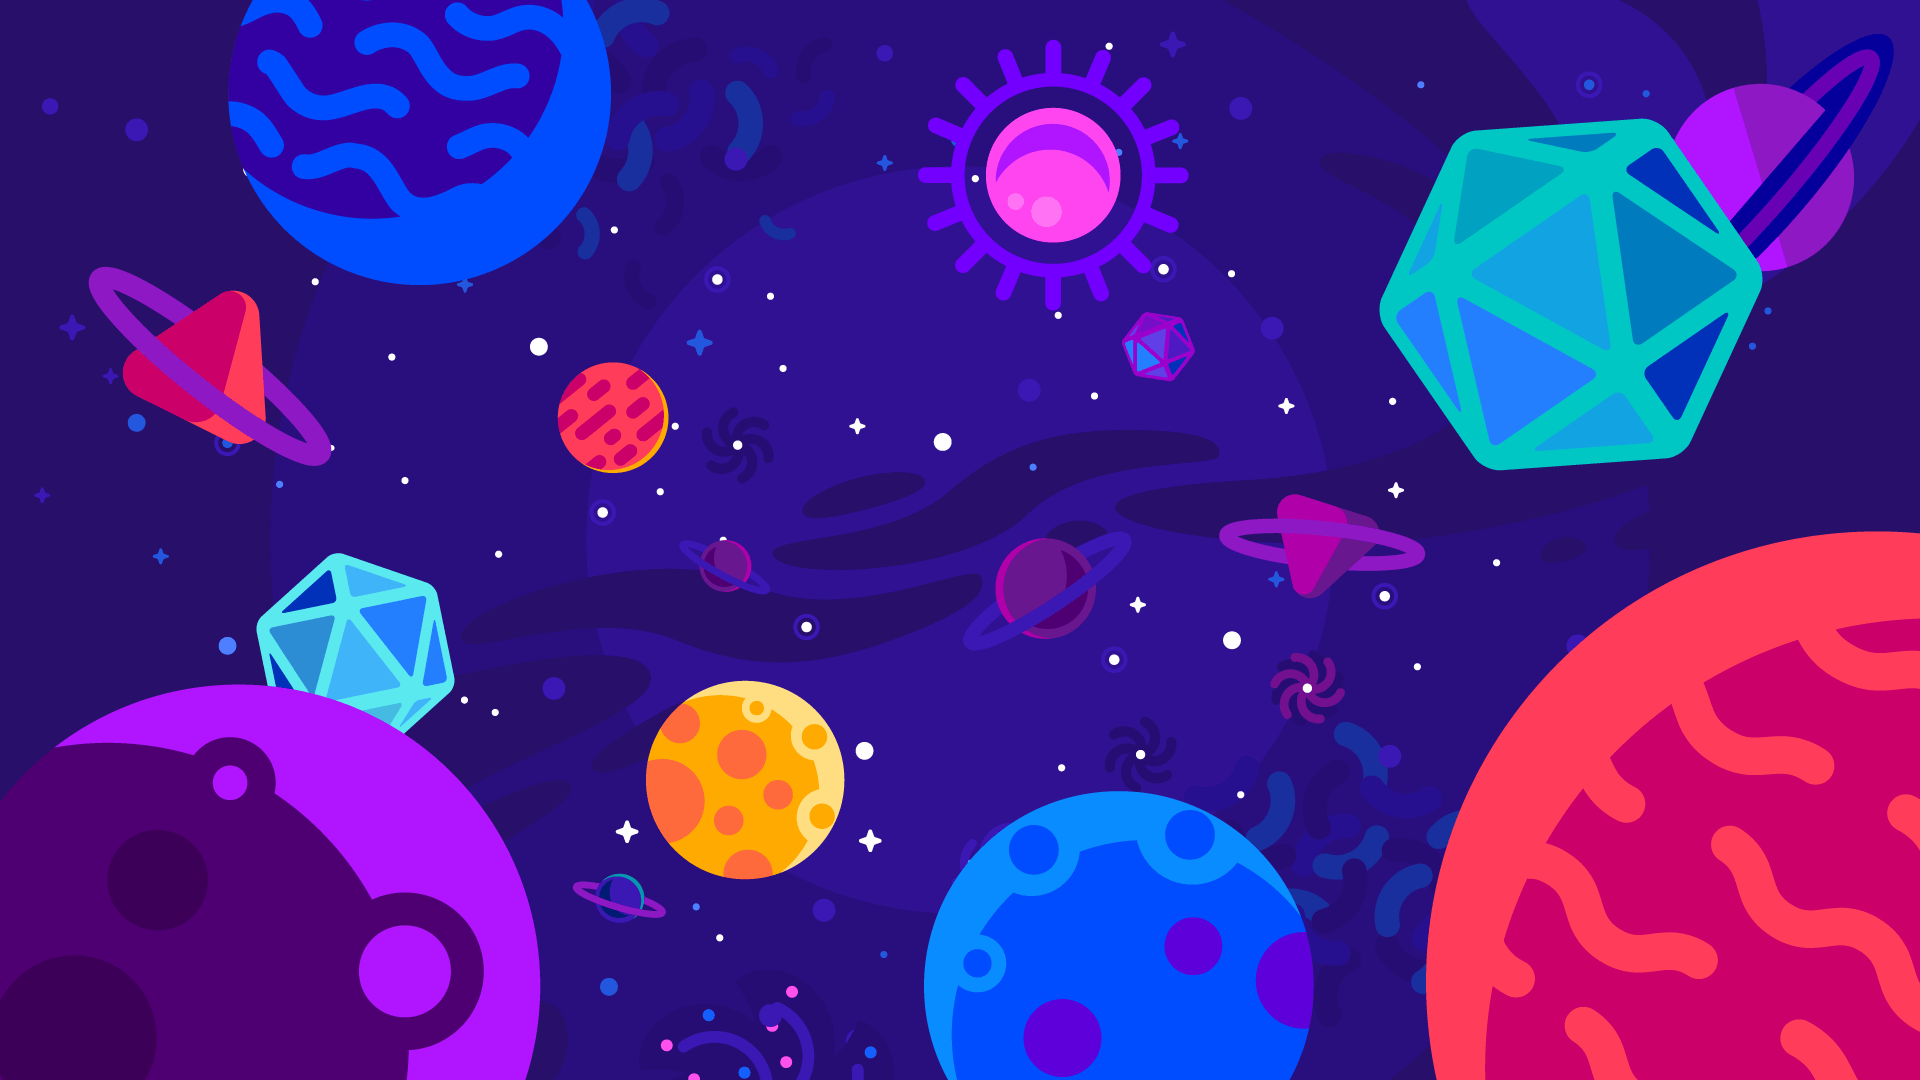 Colorful Universe Kurzgesagt Style 1920x1080 Cute Computer